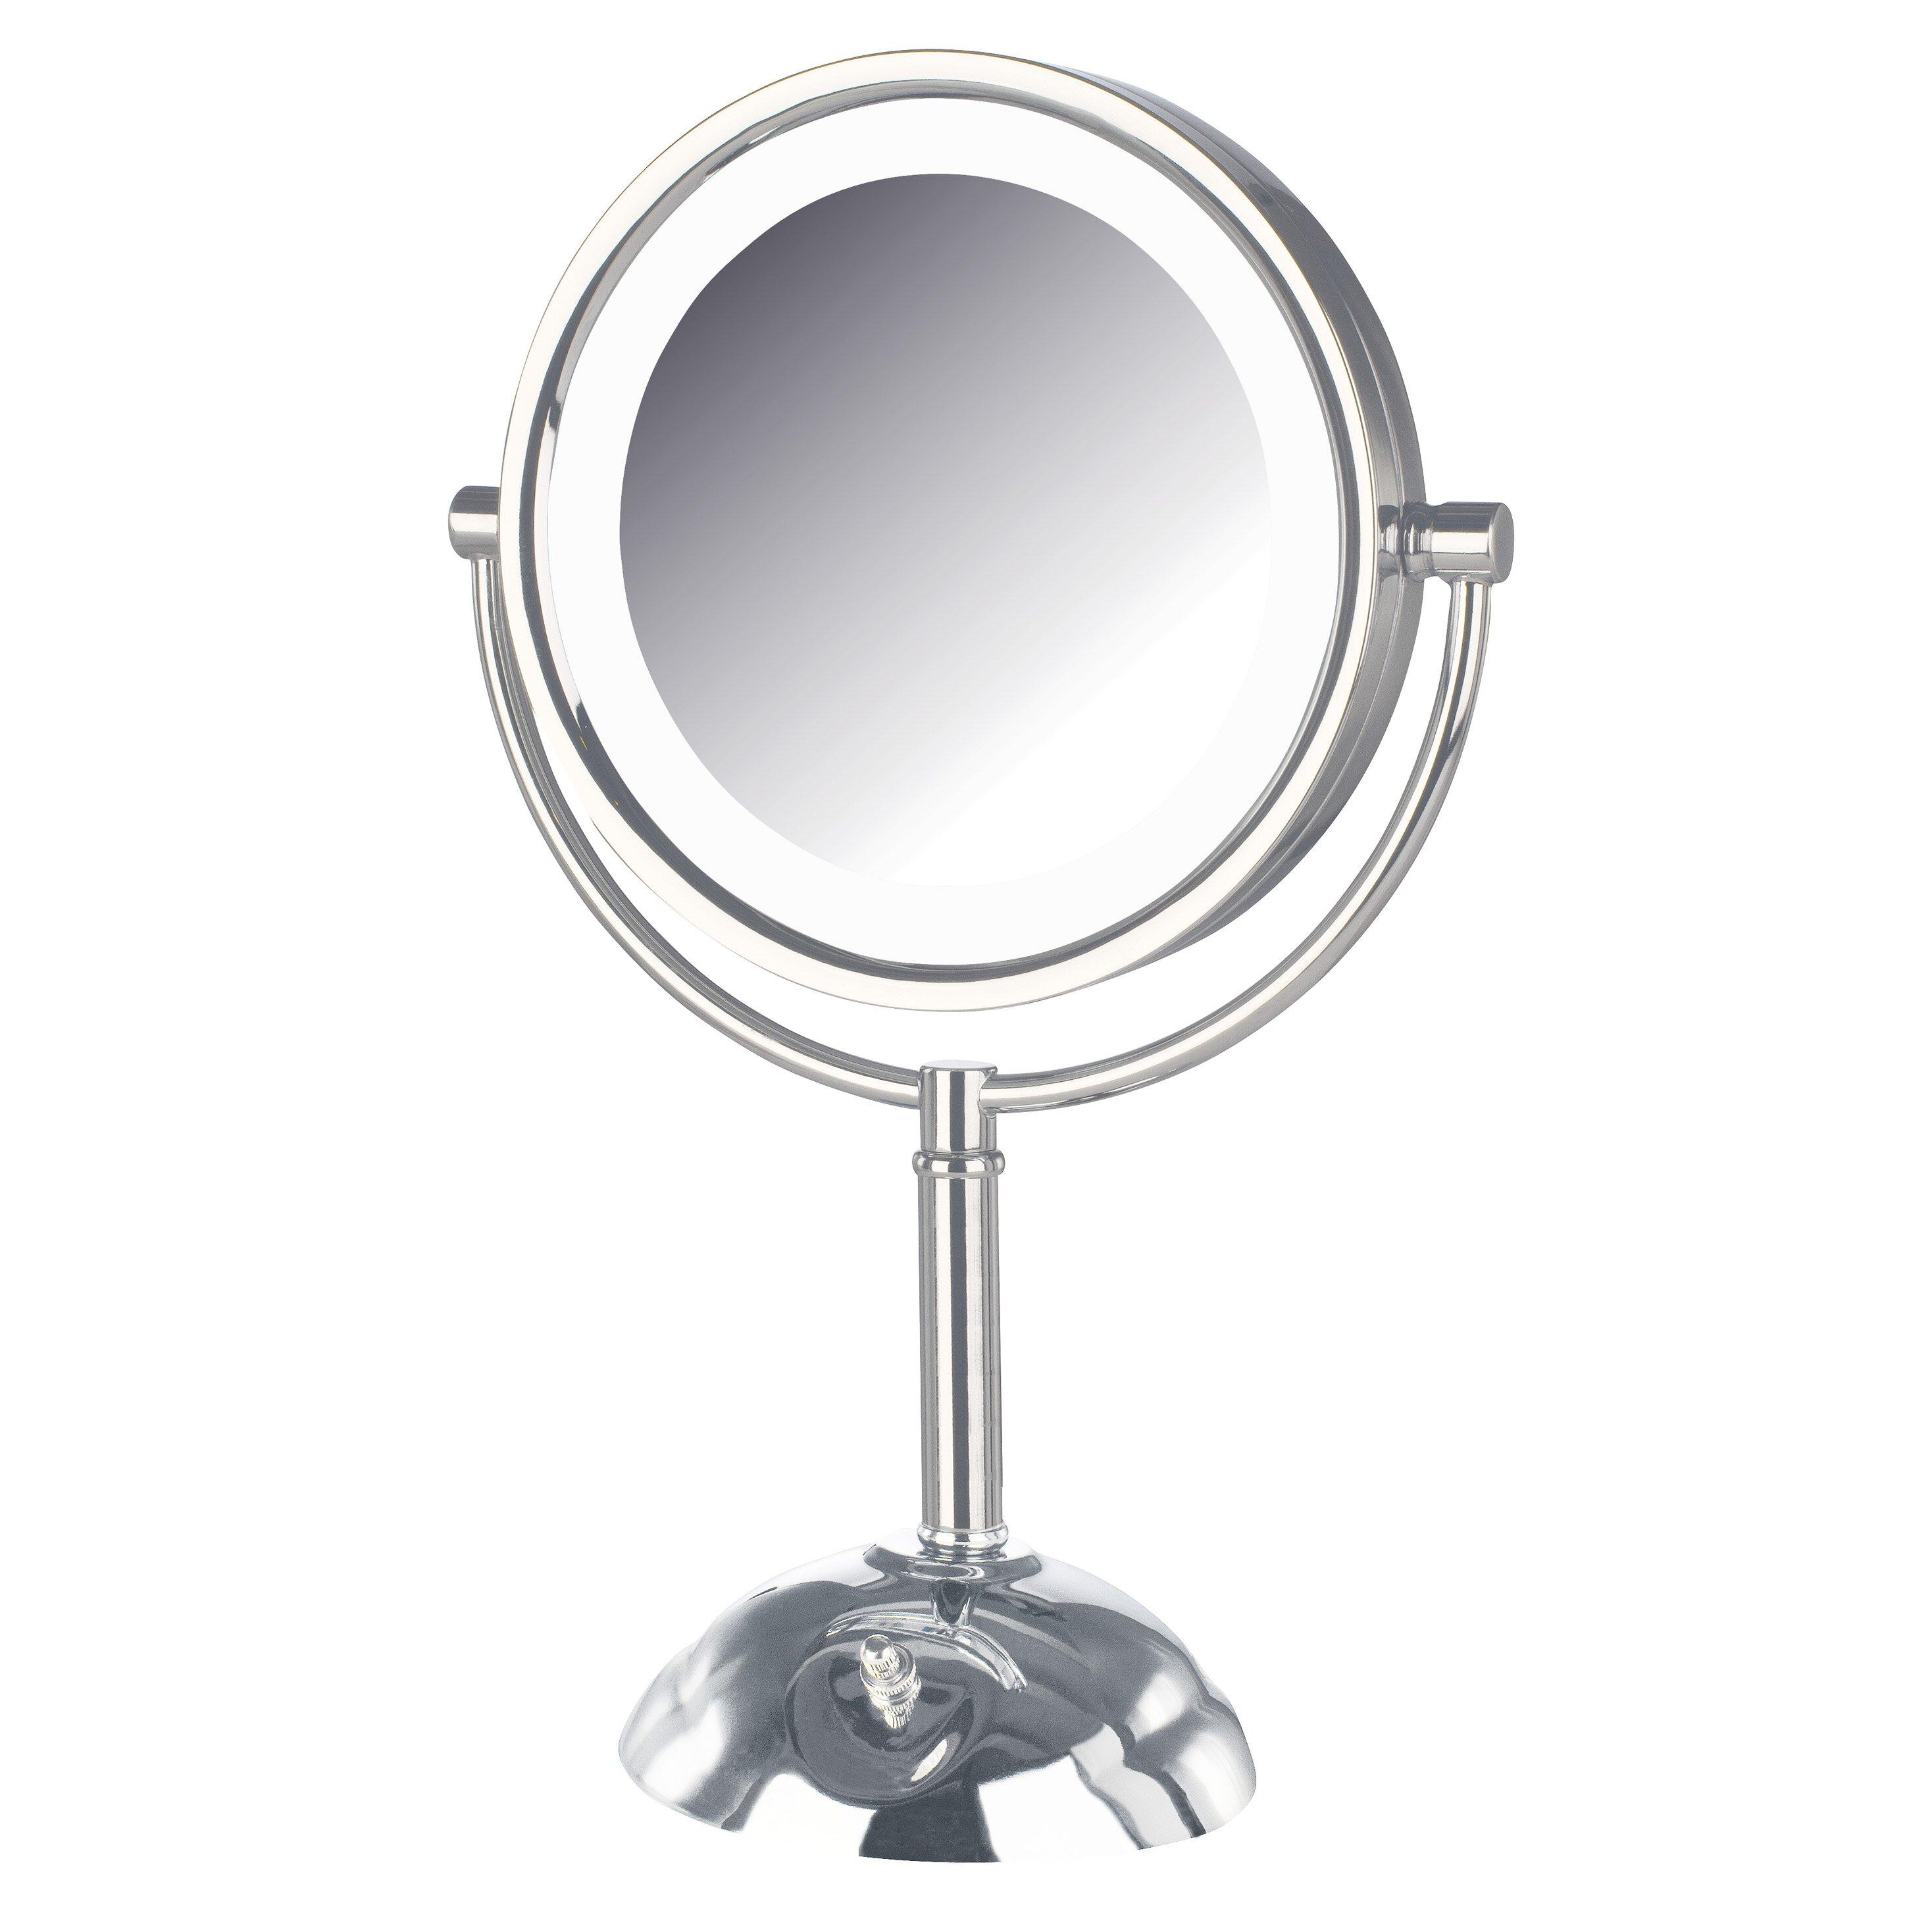 jerdon dual sided lighted led vanity mirror reviews wayfair. Black Bedroom Furniture Sets. Home Design Ideas